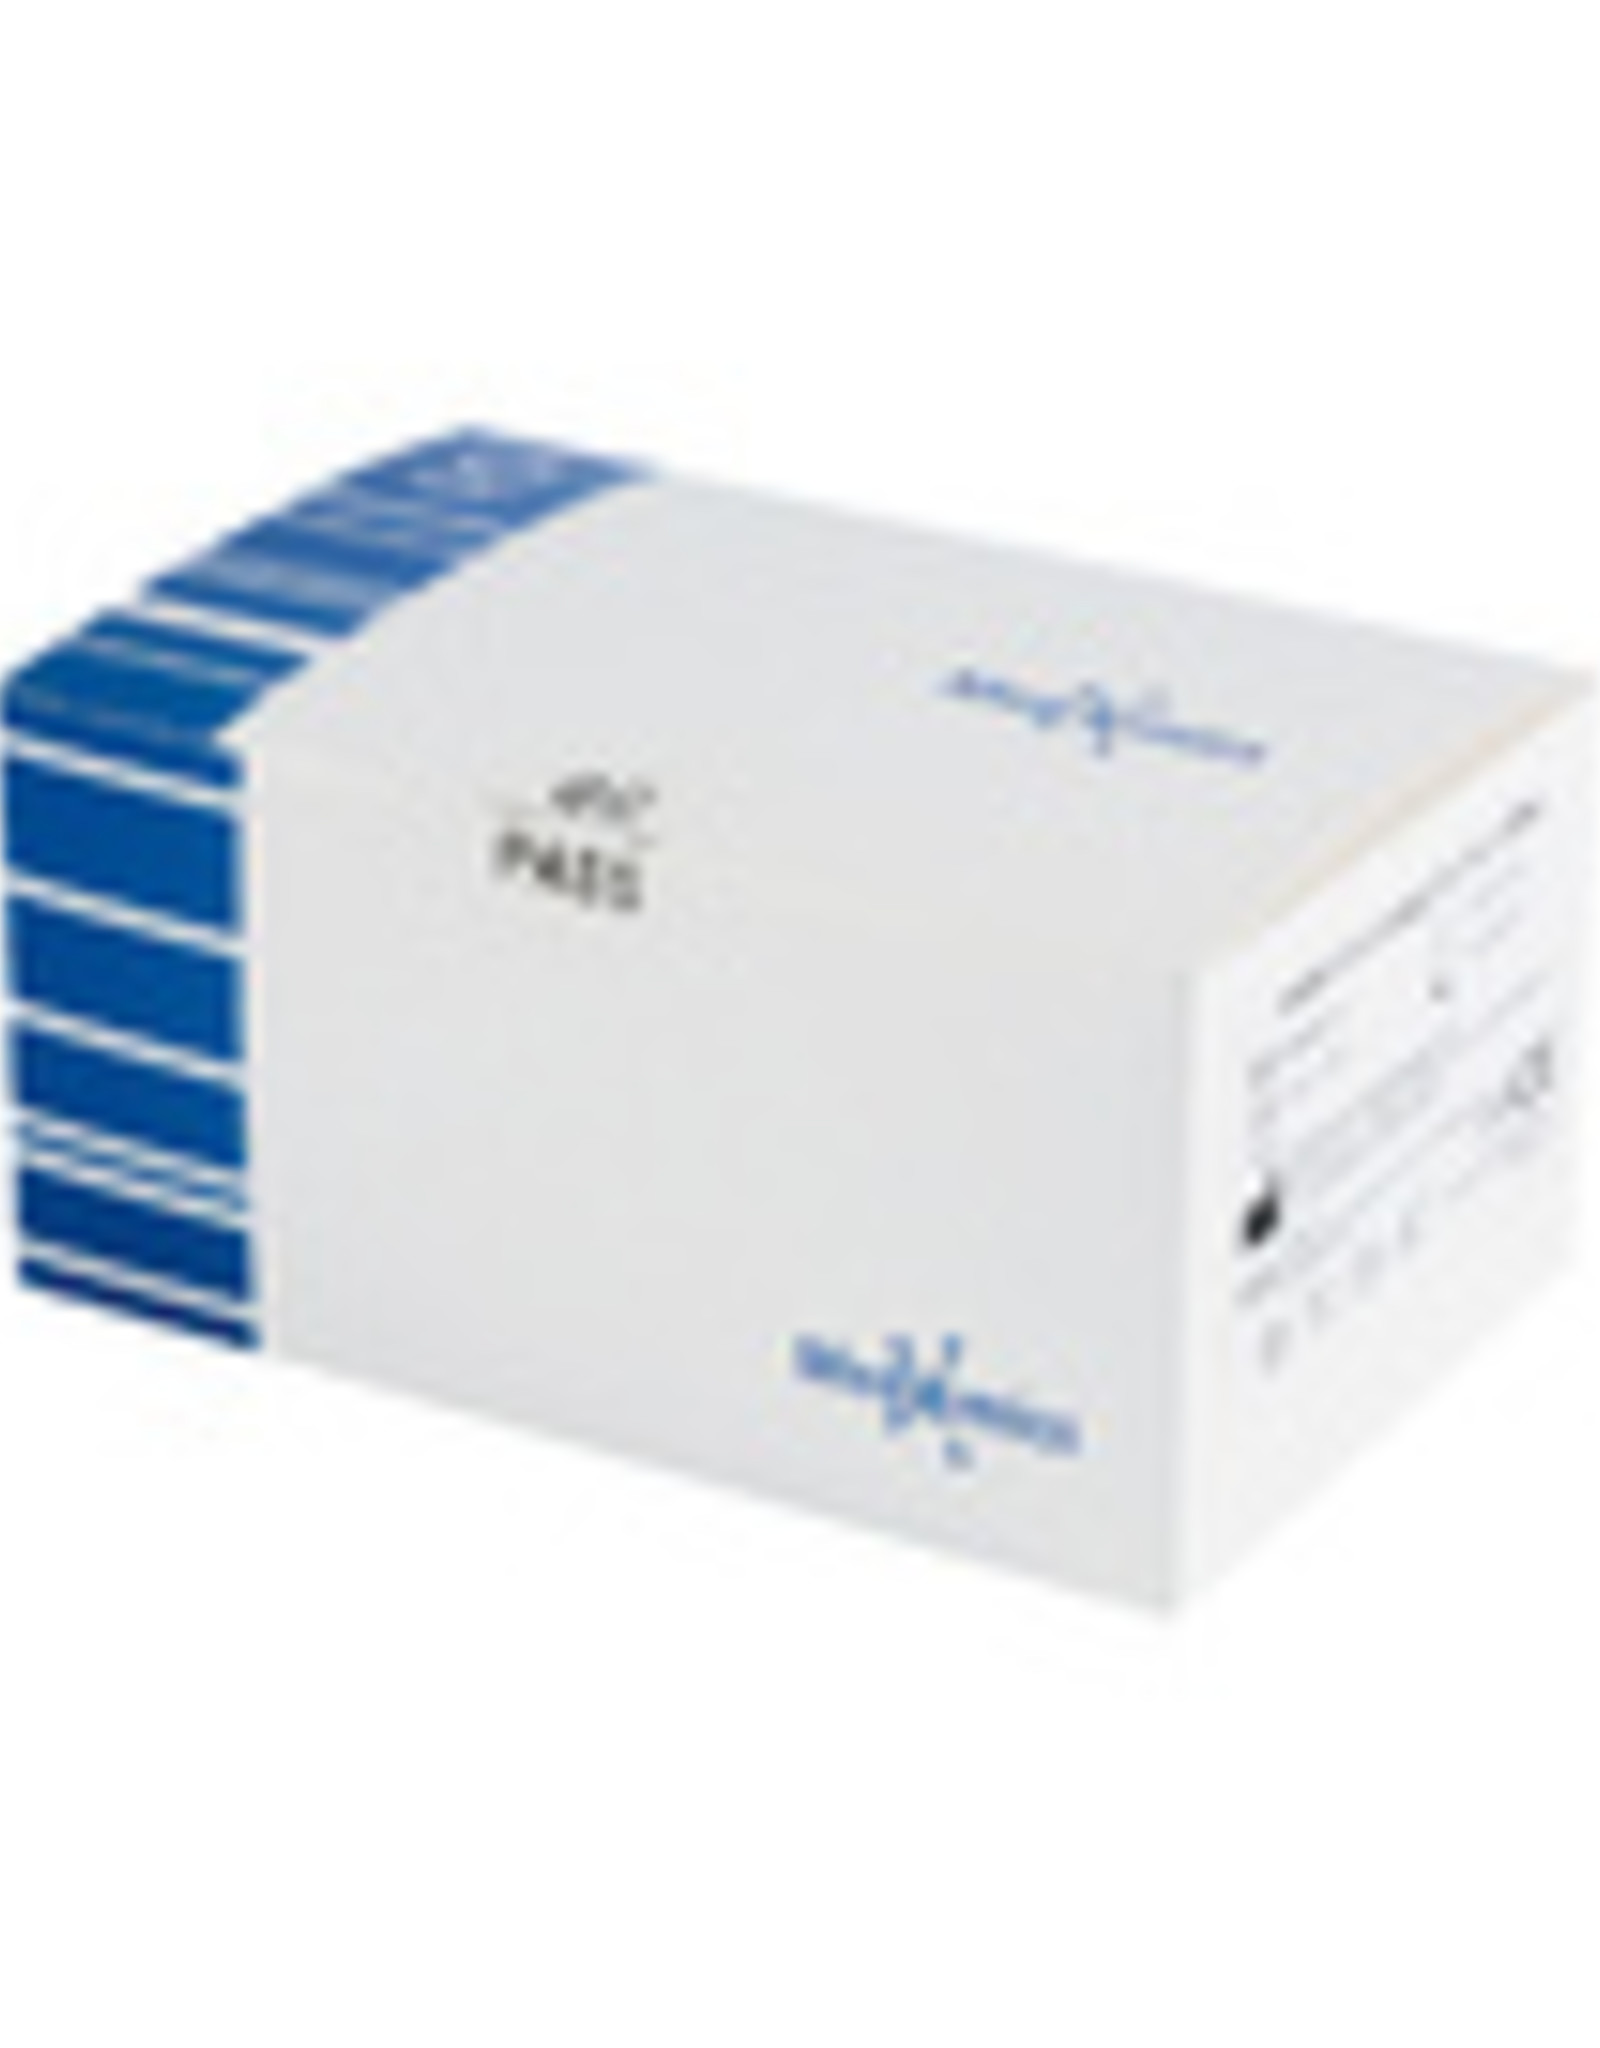 COVID 19 - Antigène SARS-CoV-2 (LFIA) - 20 tests